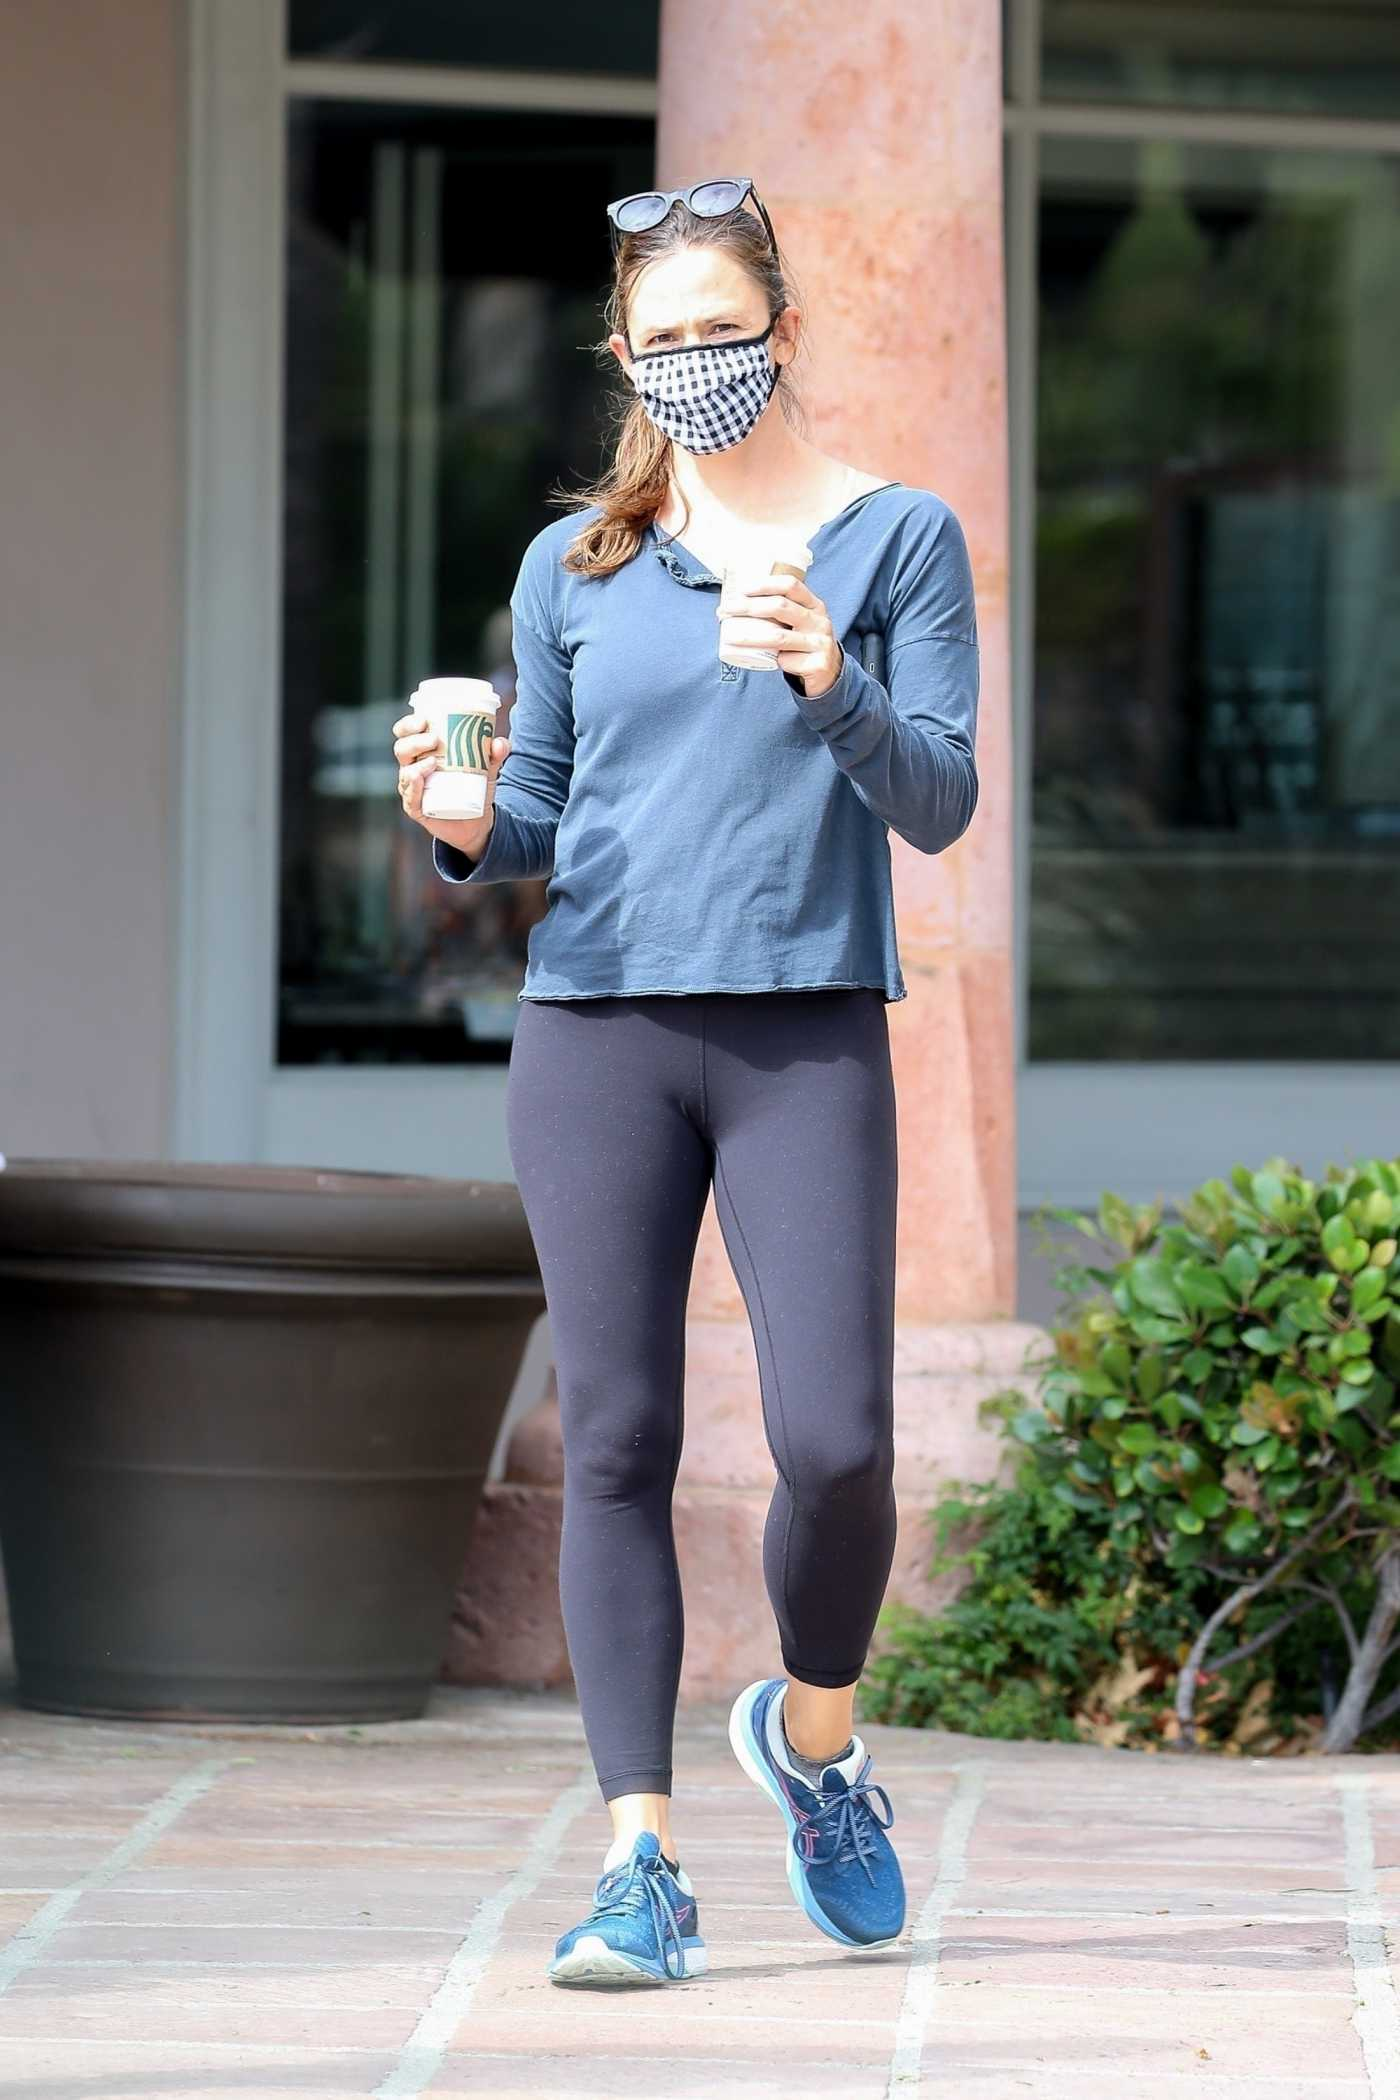 Jennifer Garner in a Protective Mask Was Seen Out in Malibu 07/10/2020